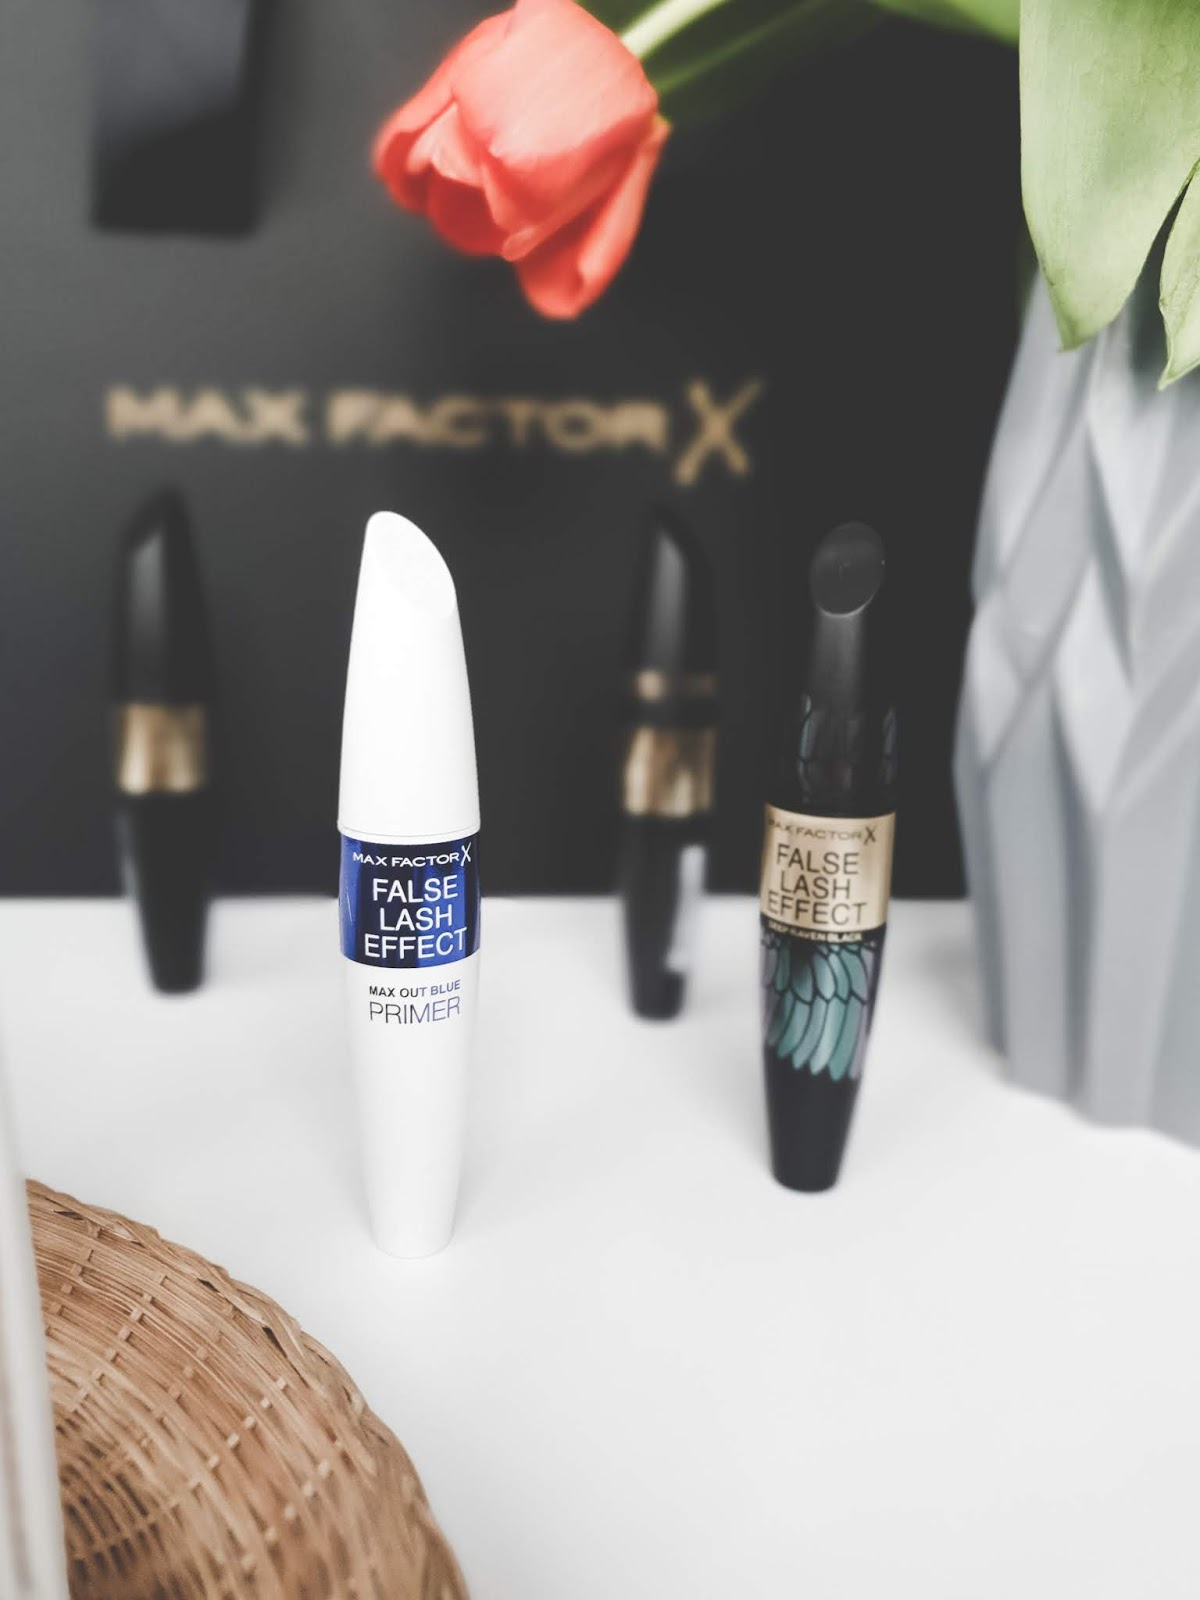 False Lash Effect Max Out Primer - Max Factor